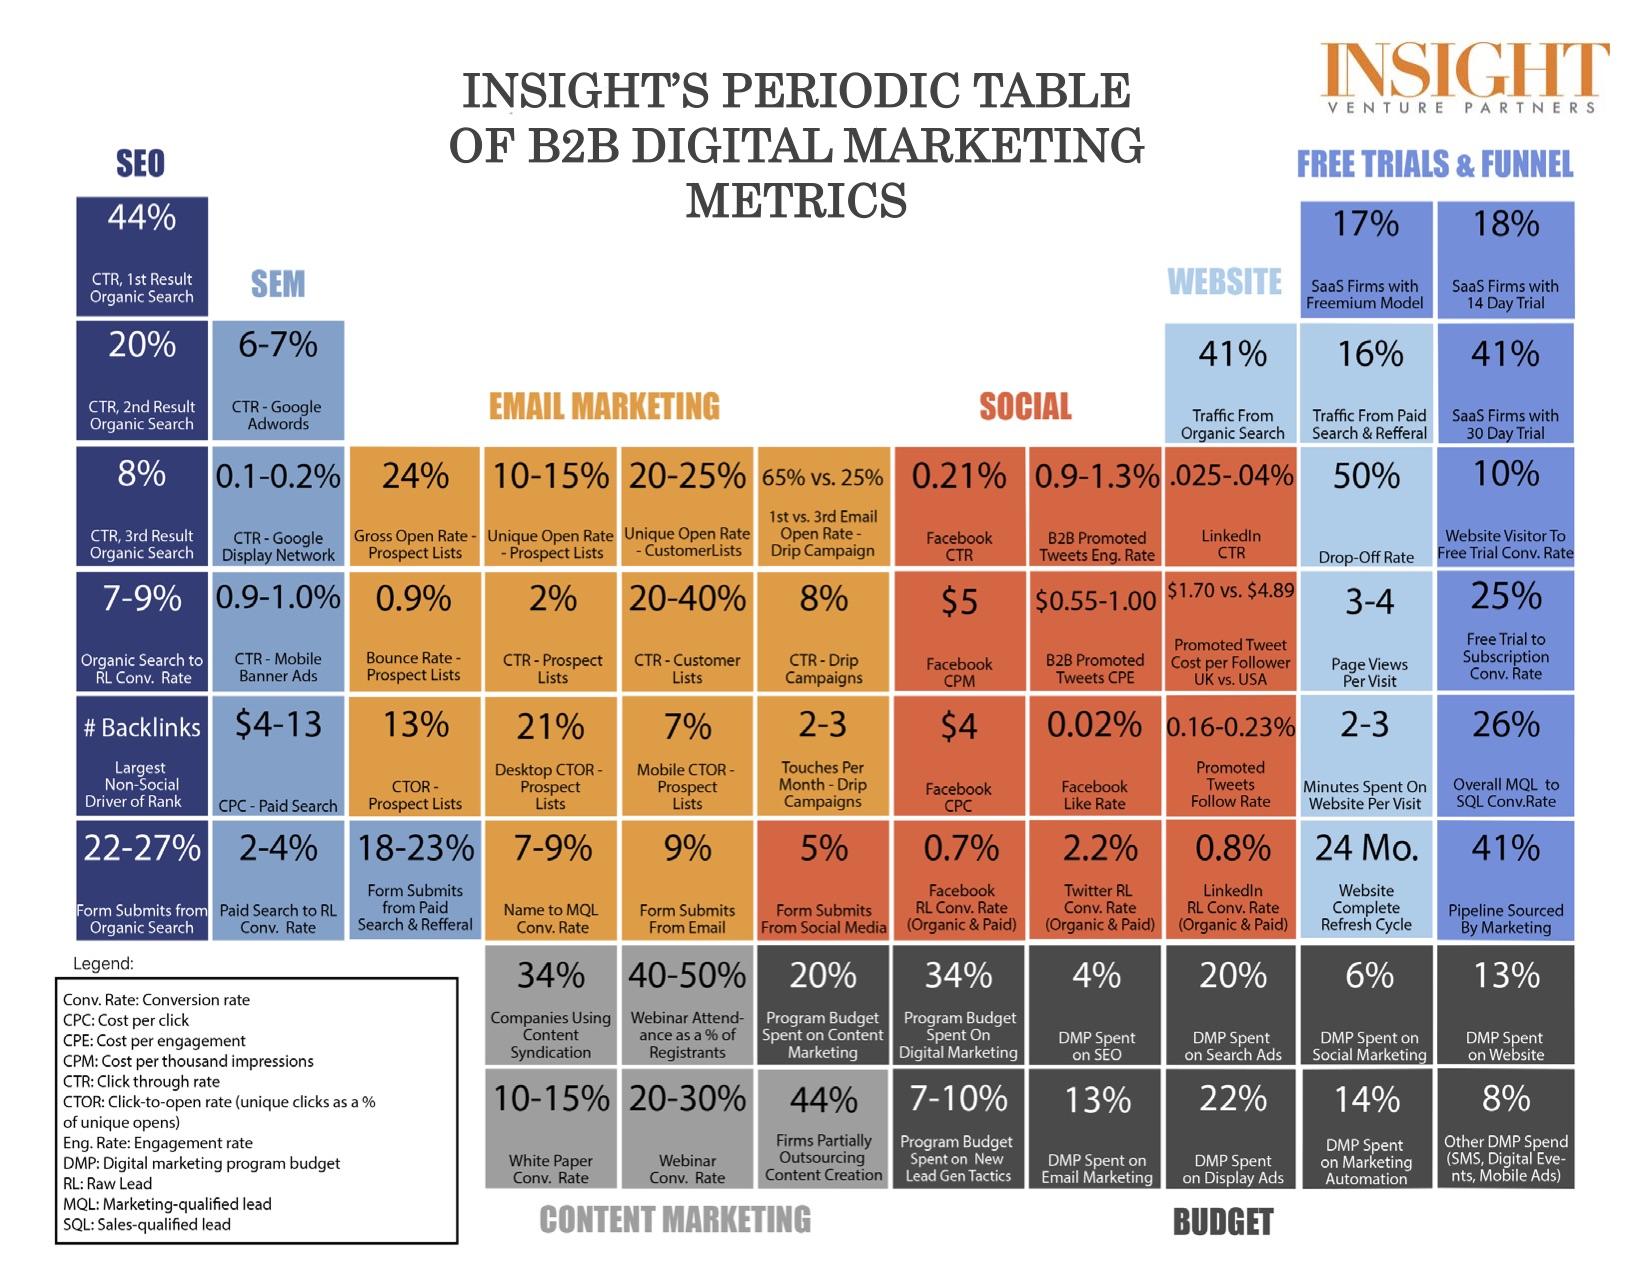 Tabla peridica de mtricas para marketing digital b2b tabla peridica de mtricas para marketing digital b2b urtaz Gallery